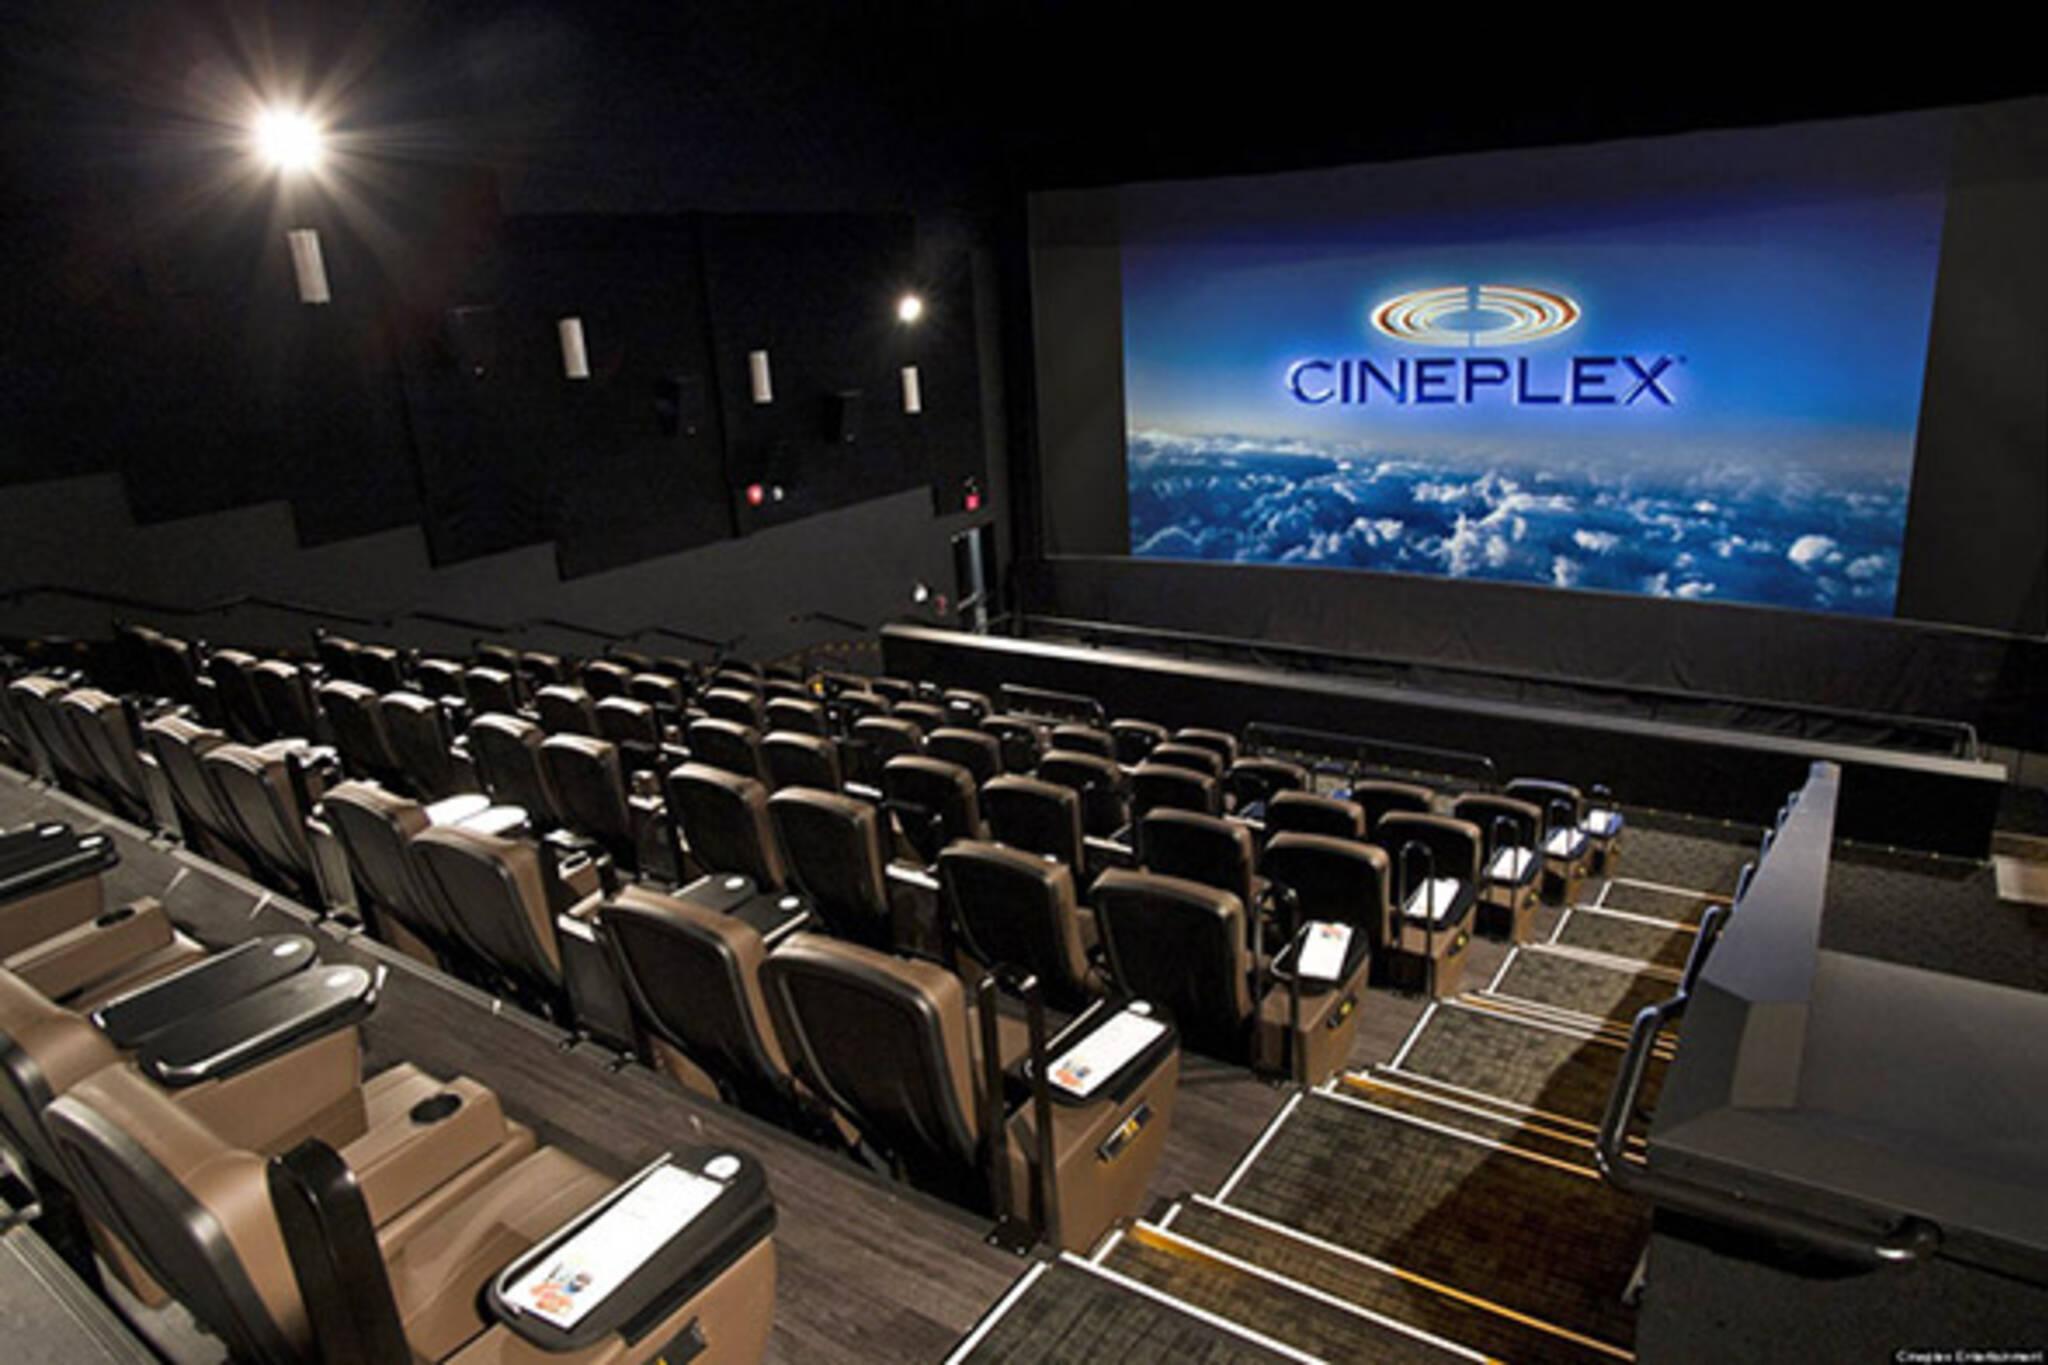 Cineplex Ticket Prices - Movie Theater Prices